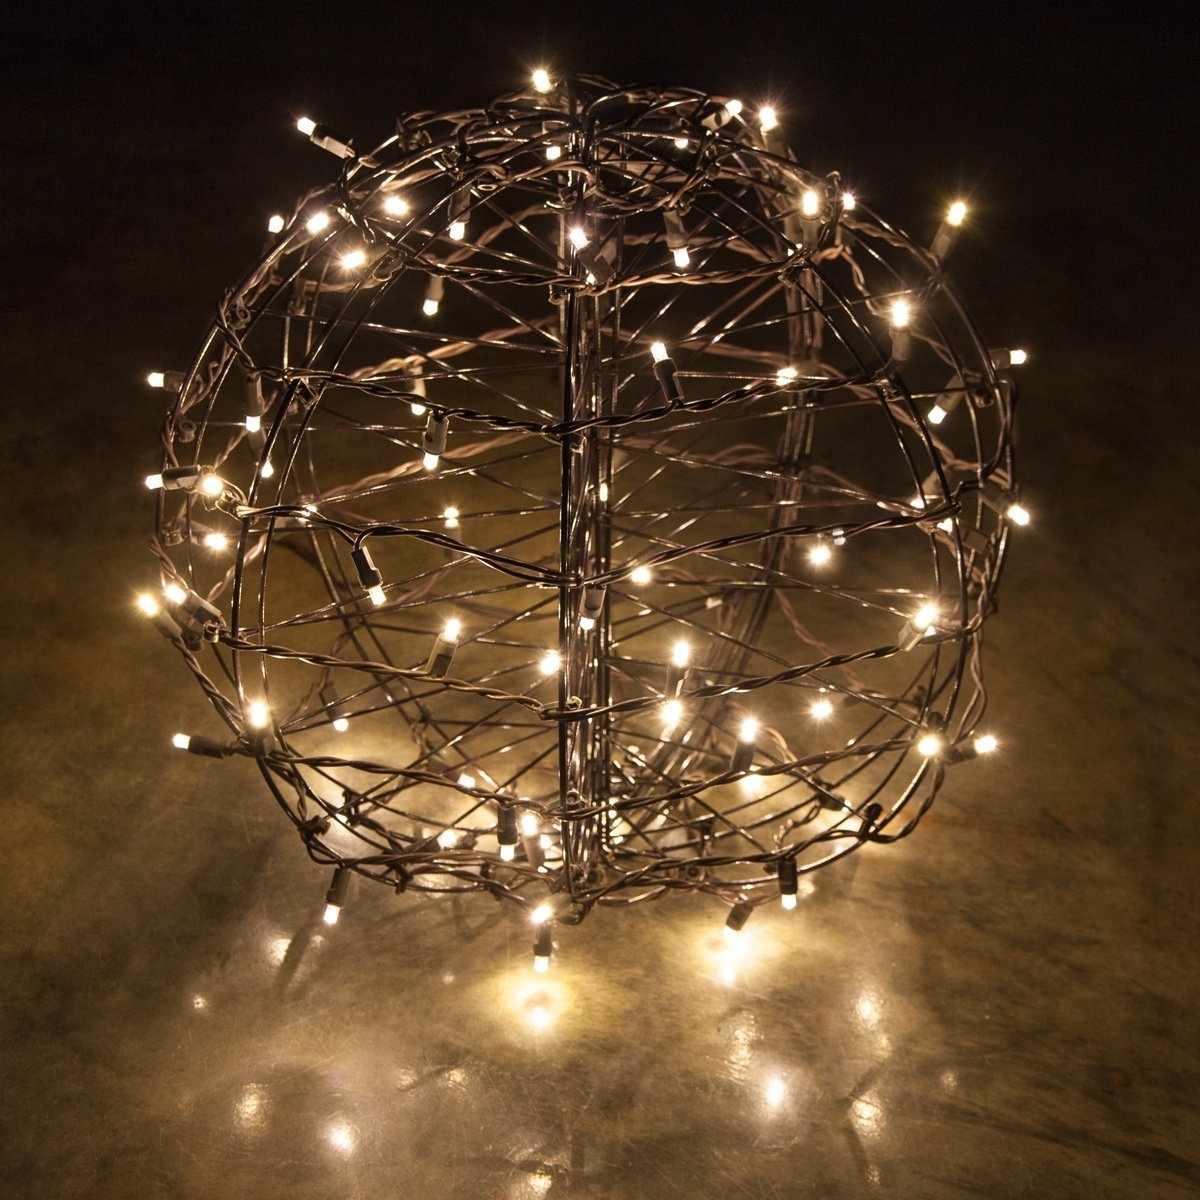 2019 Outdoor Hanging Sphere Lights Within Outdoor Hanging Sphere Lights • Outdoor Lighting (View 1 of 20)